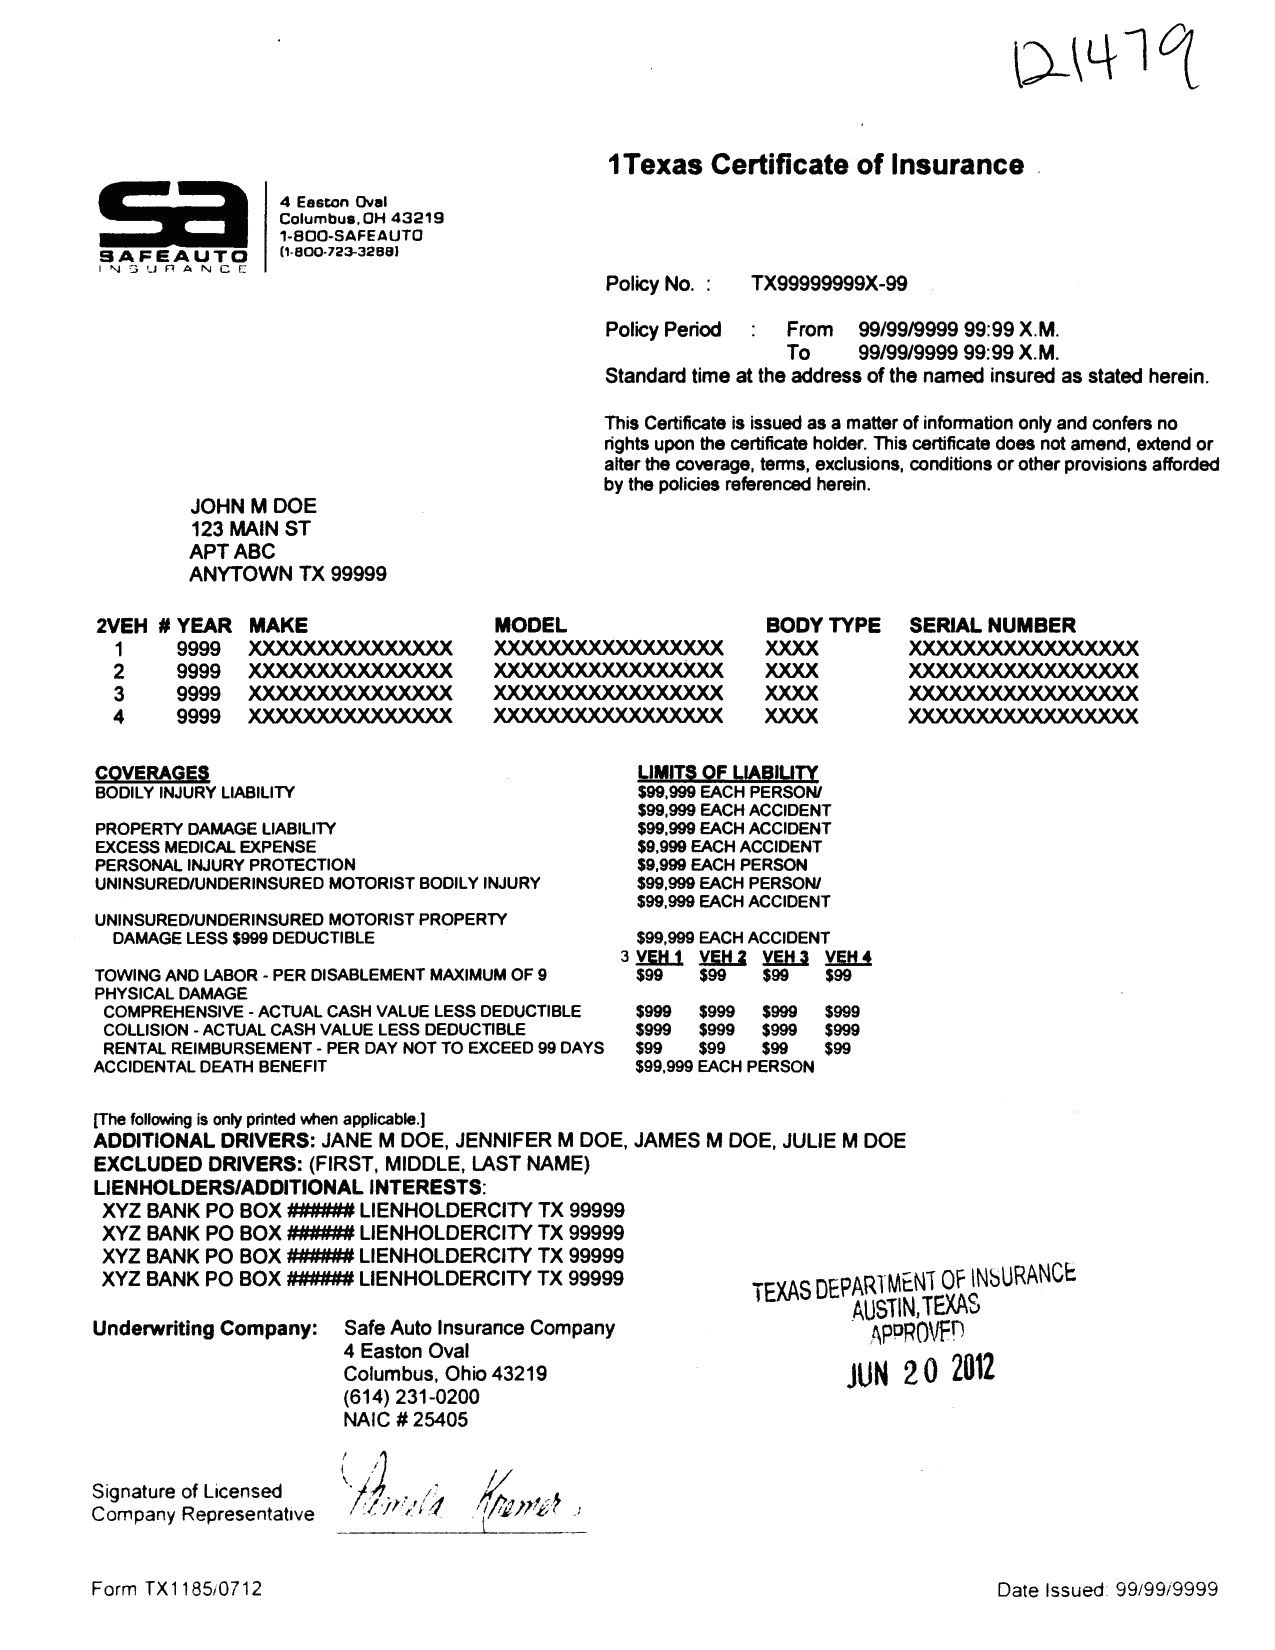 Texas Progressive Progressive Proof Of Insurance Template Inside Proof Of Insurance Card Template Cumed Org Card Template Car Insurance Progressive Insurance Texas liability insurance card template